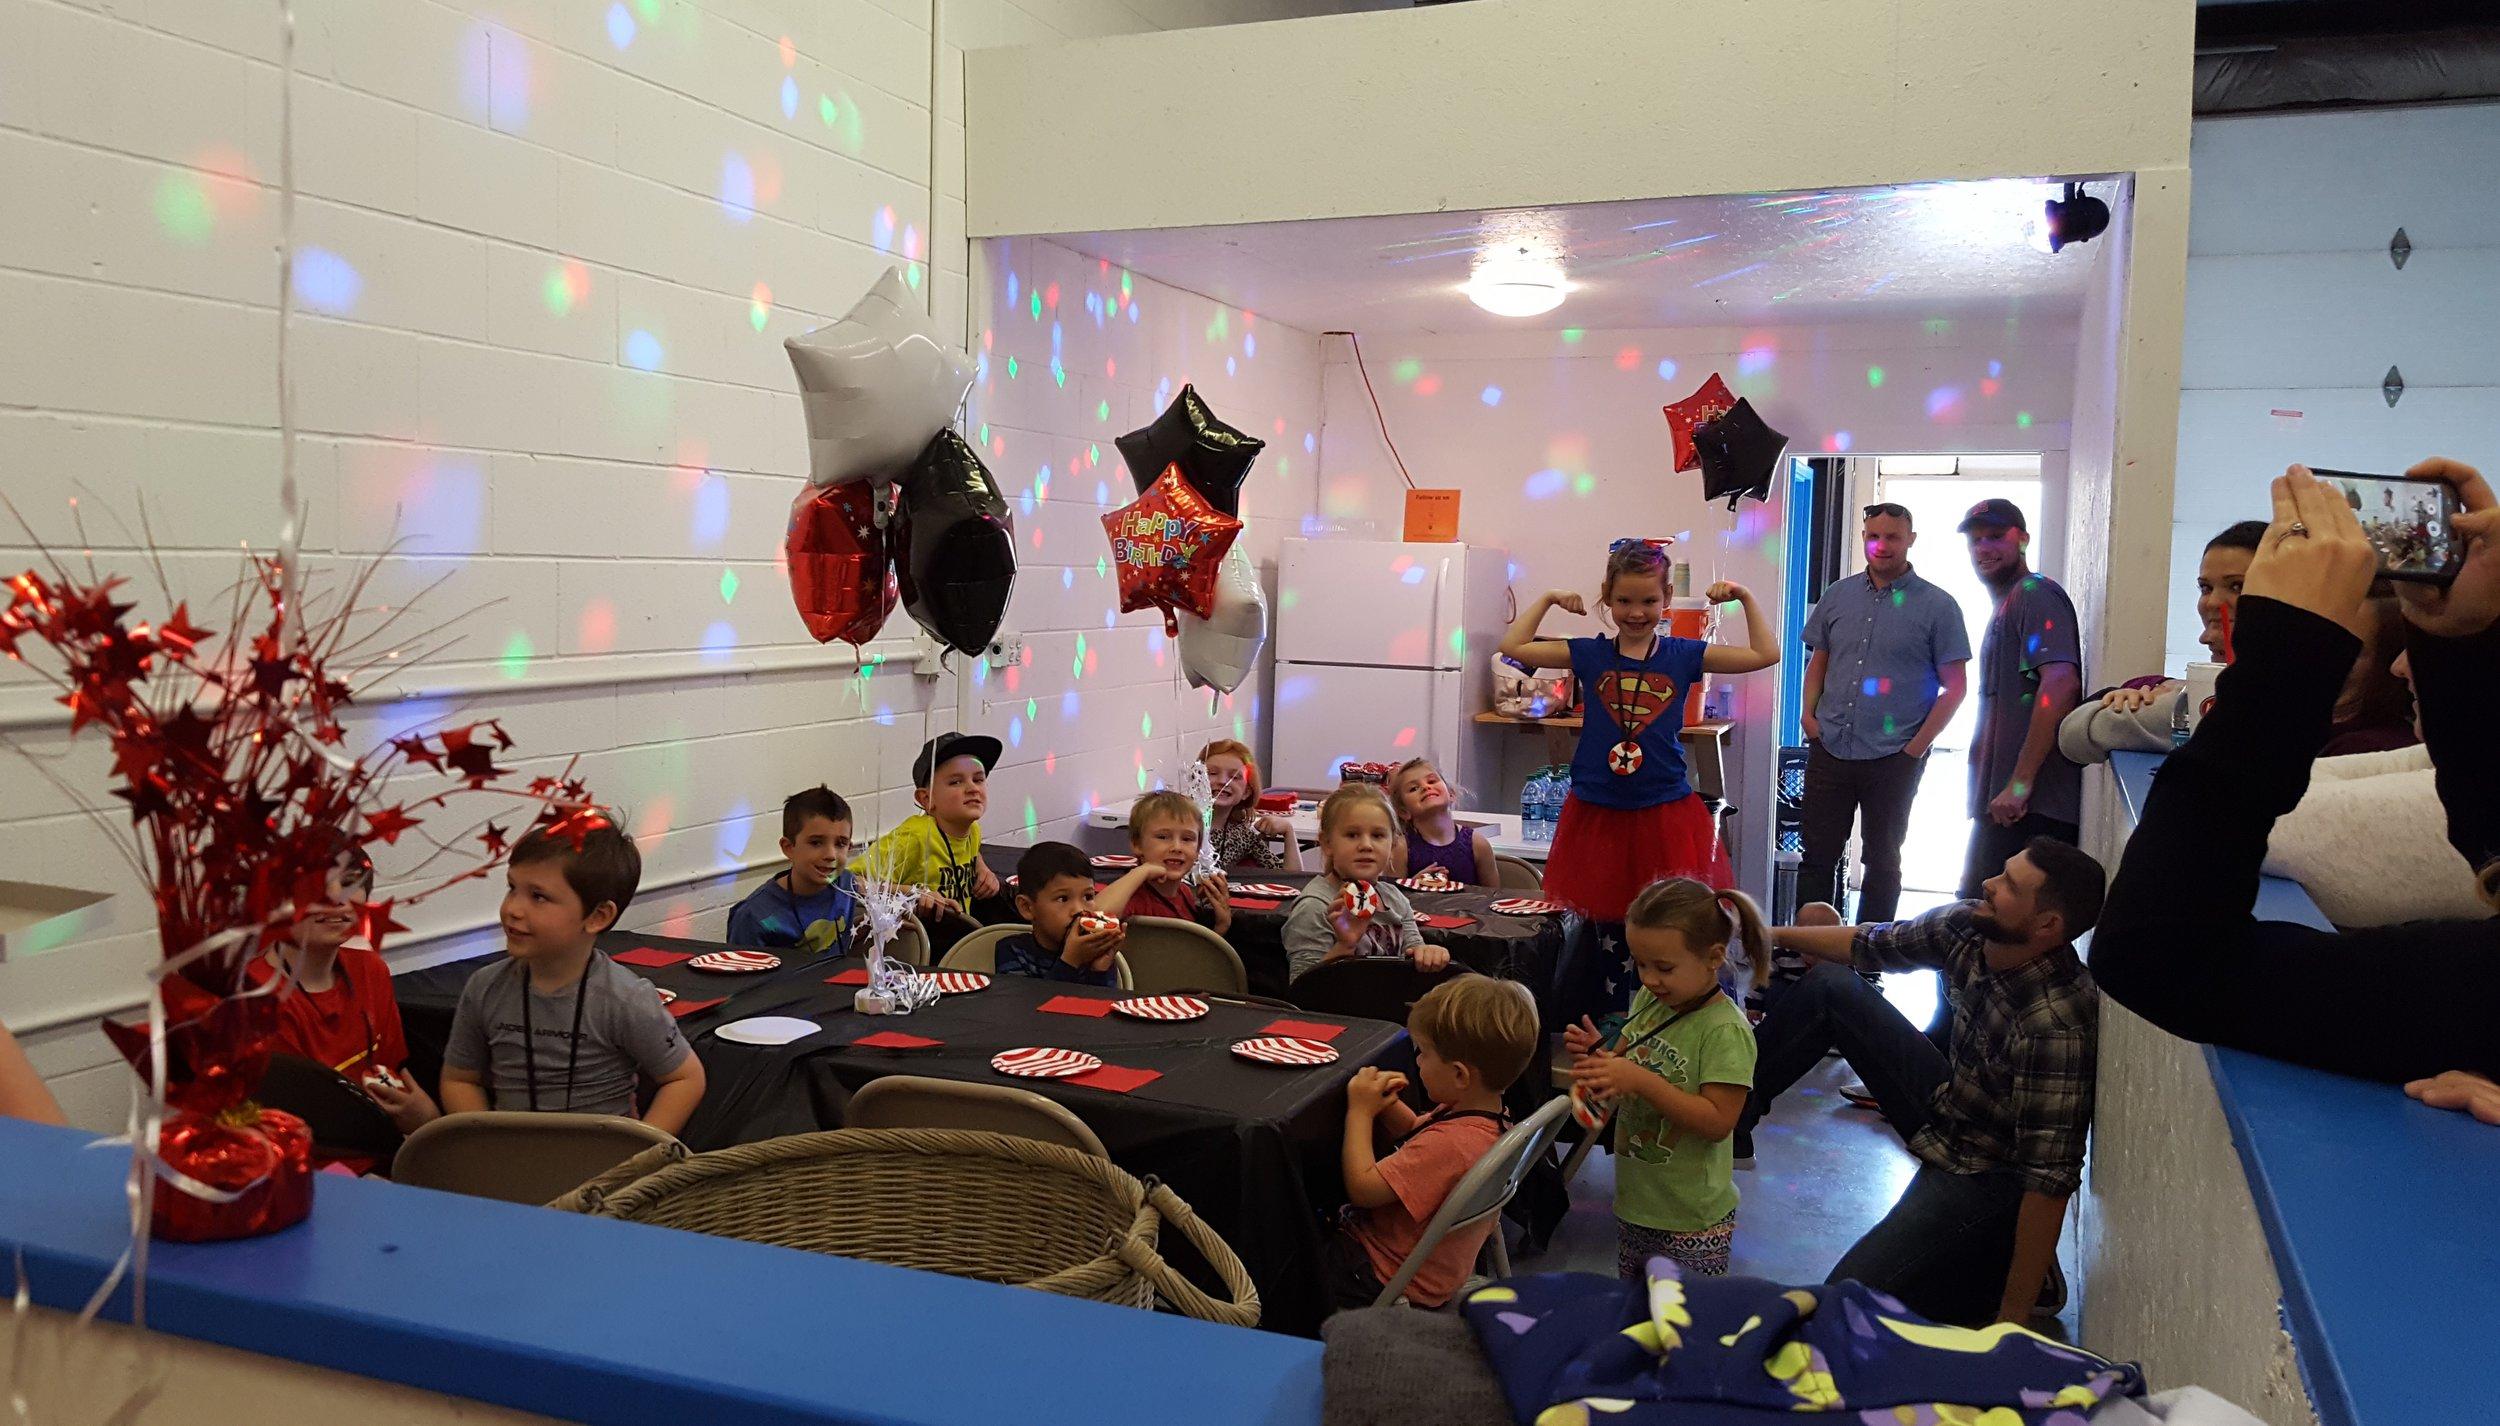 Warrior Sports Birthday Party